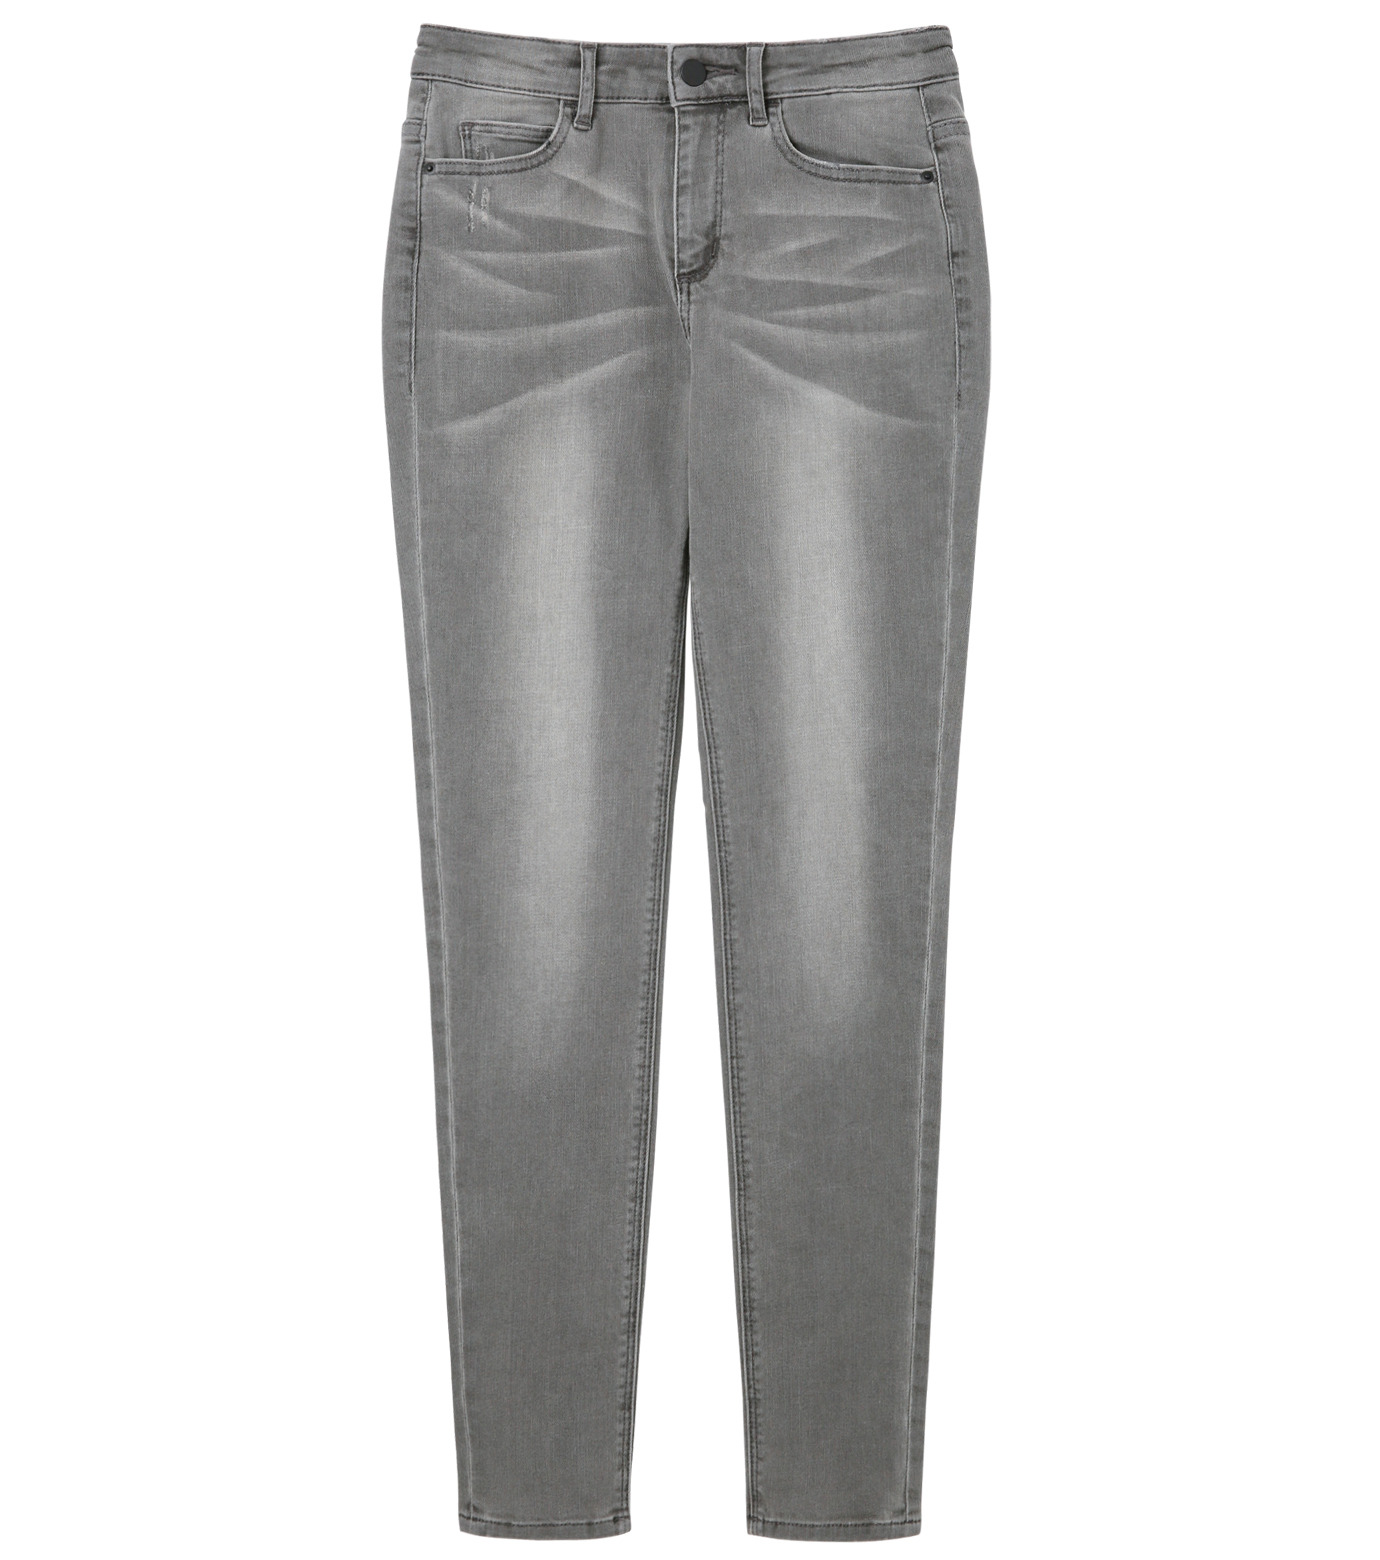 LE CIEL BLEU(ルシェルブルー)のグレ-スキニ- by Essentials-GRAY(パンツ/pants)-17S68008 拡大詳細画像1